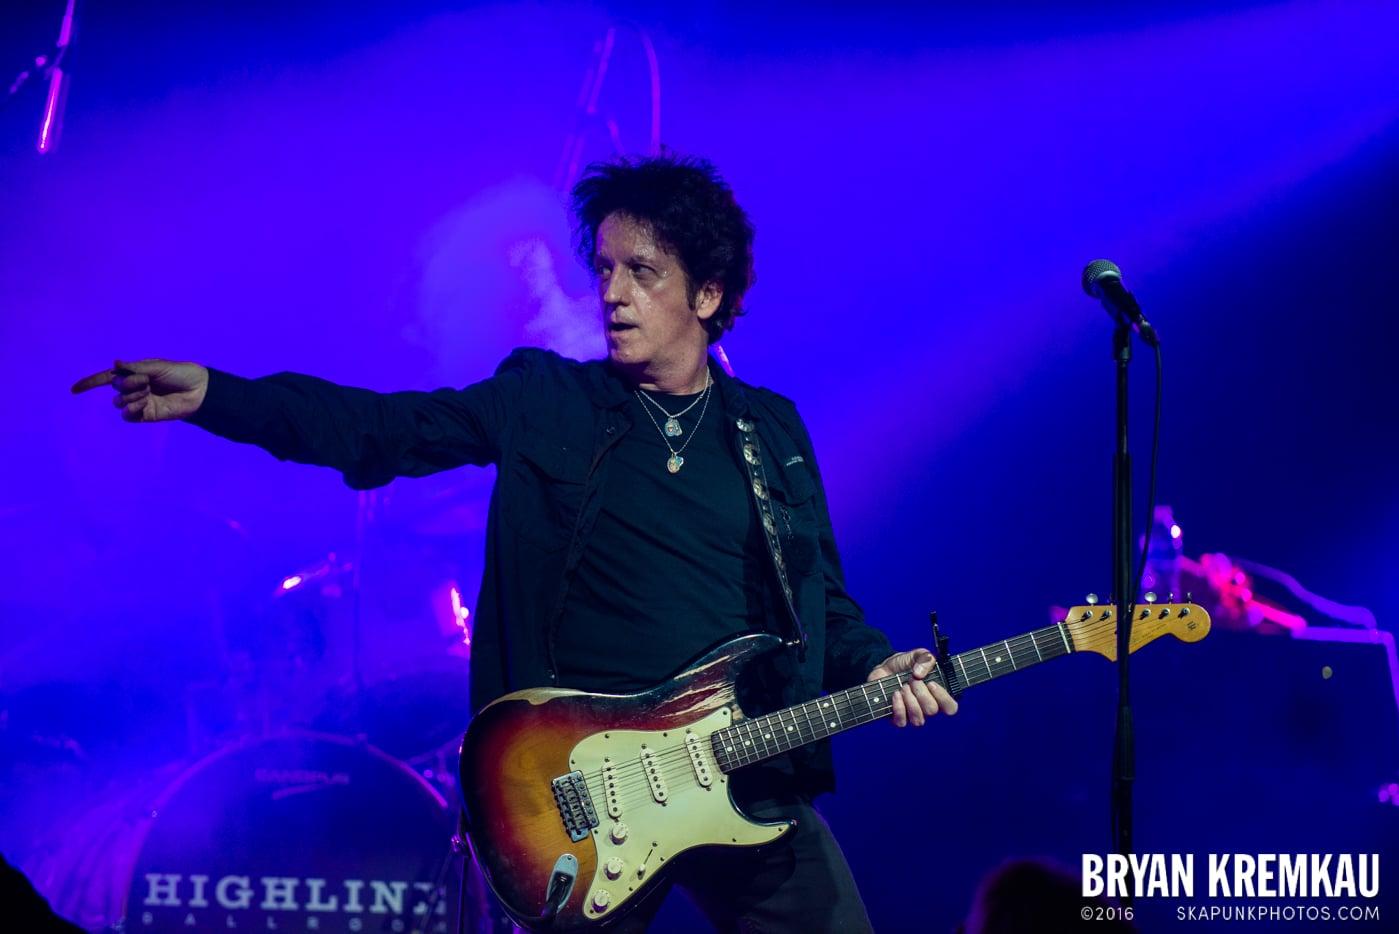 Willie Nile @ Highline Ballroom, NYC - 12.26.14 (45)